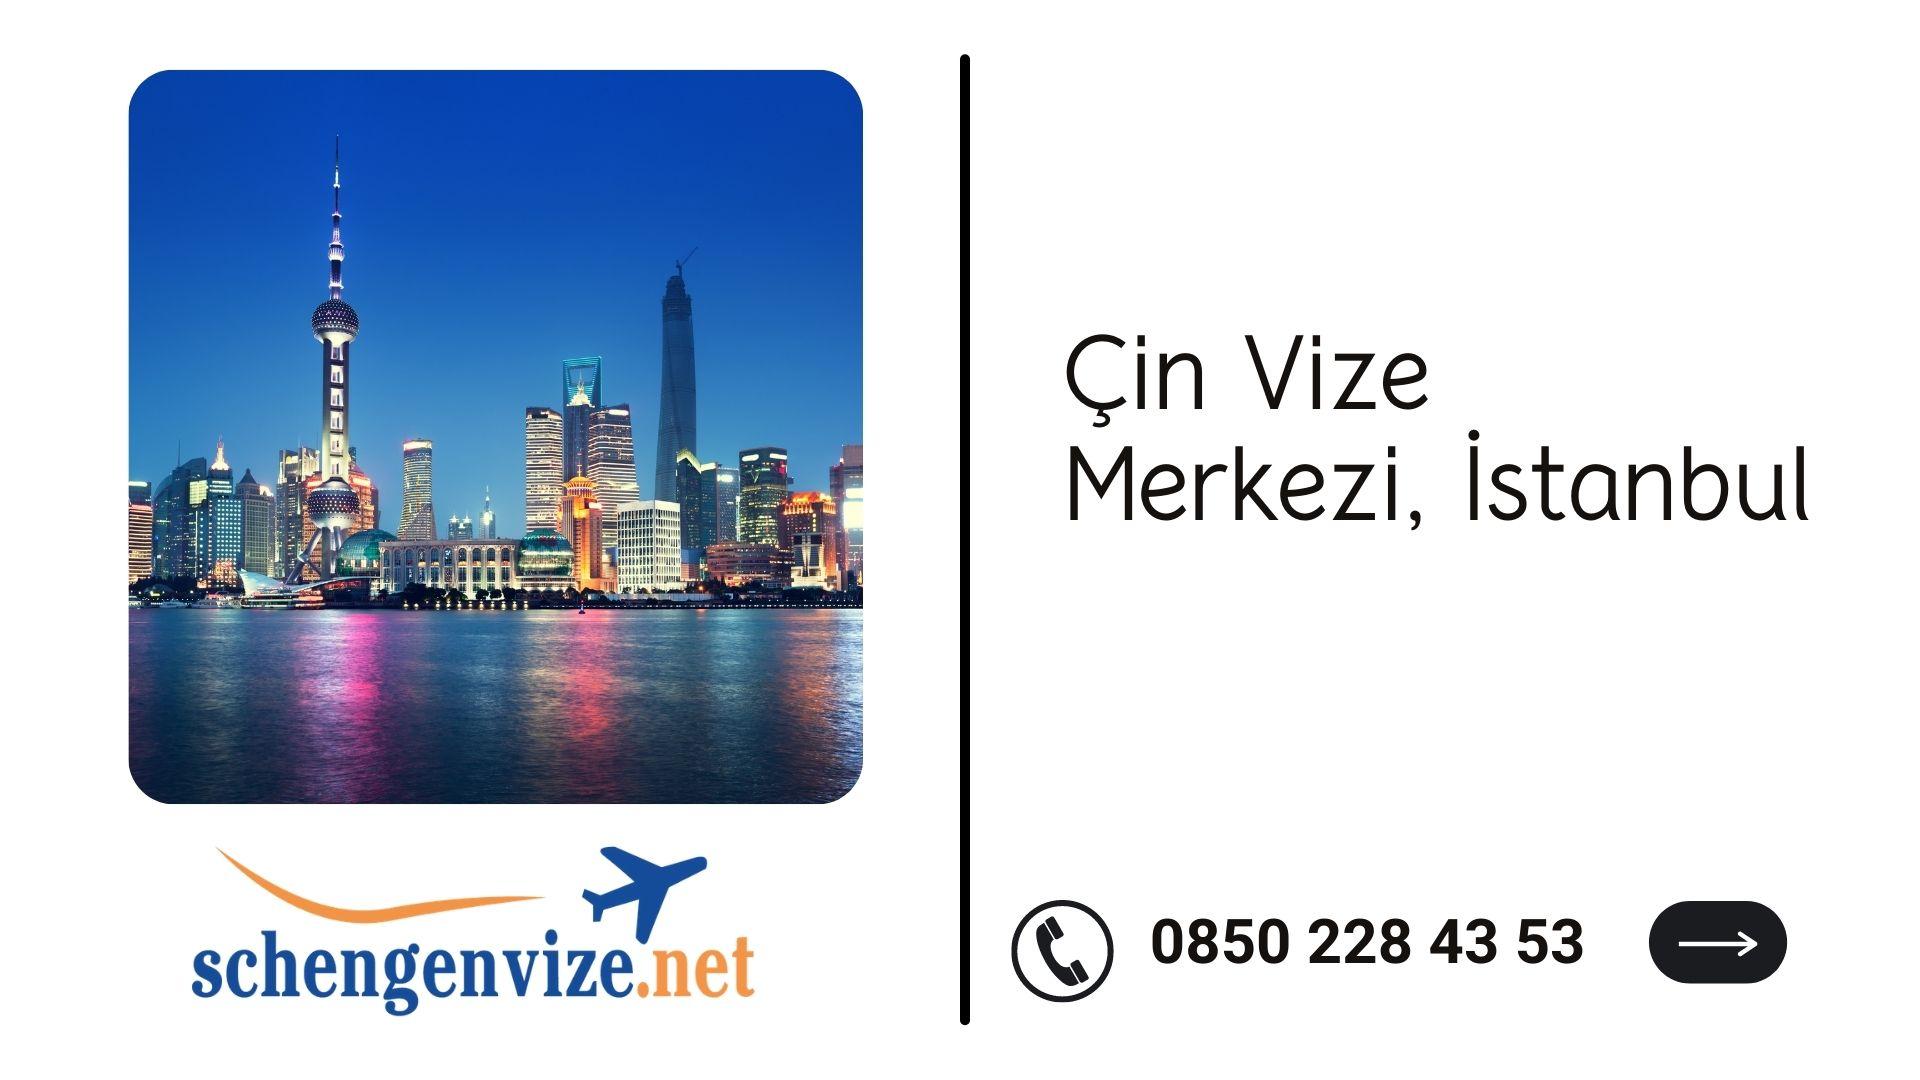 Çin Vize Merkezi, İstanbul